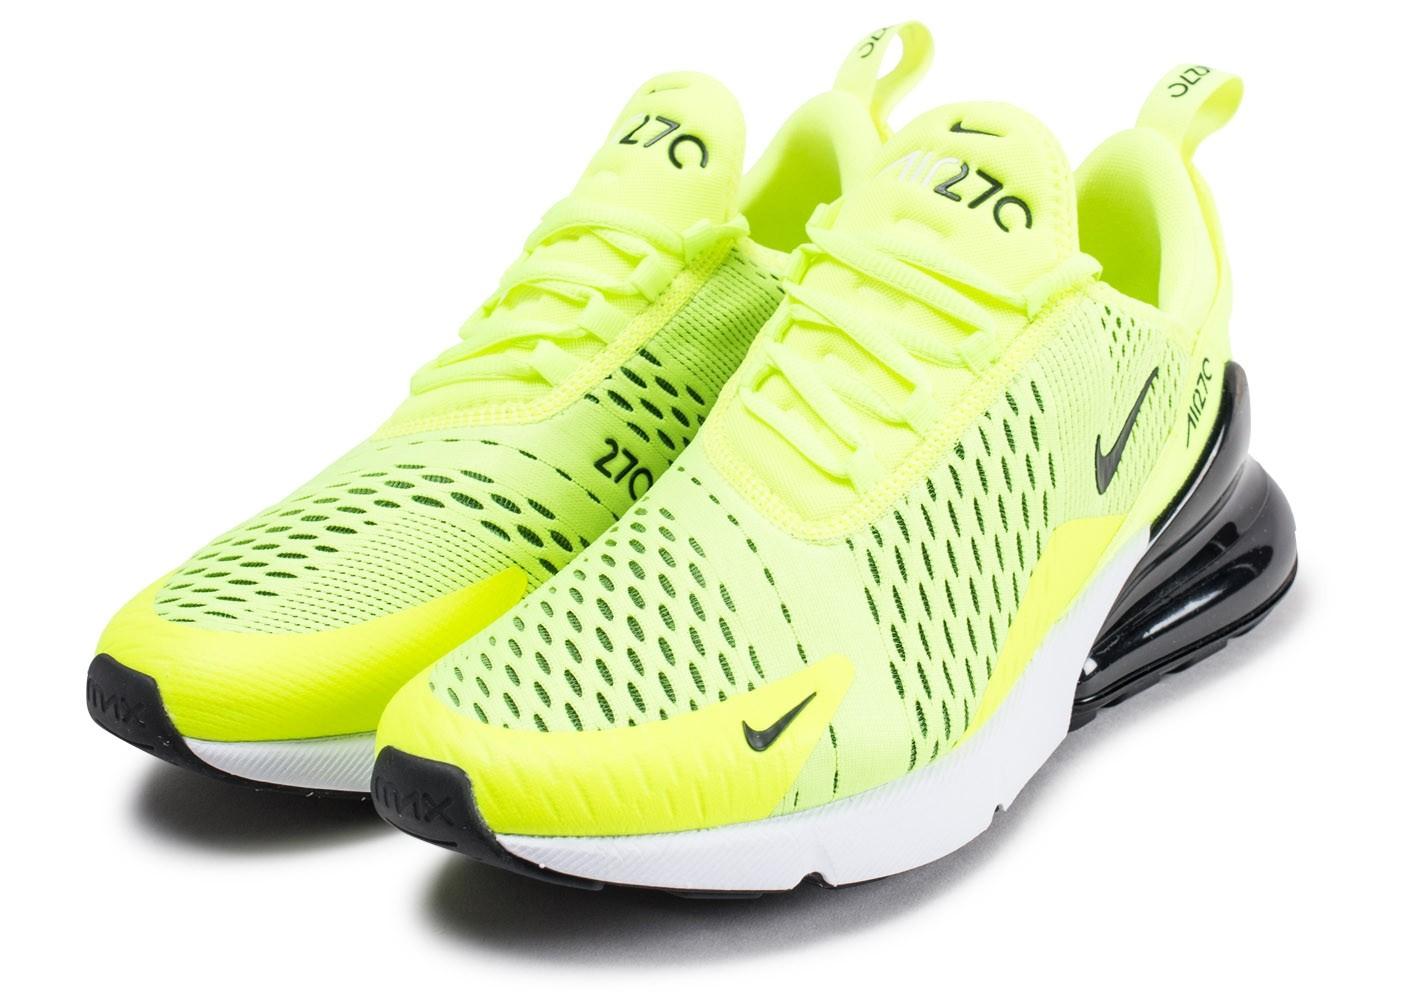 air max fluo,Chaussures Nike Air Max 270 vert fluo vue